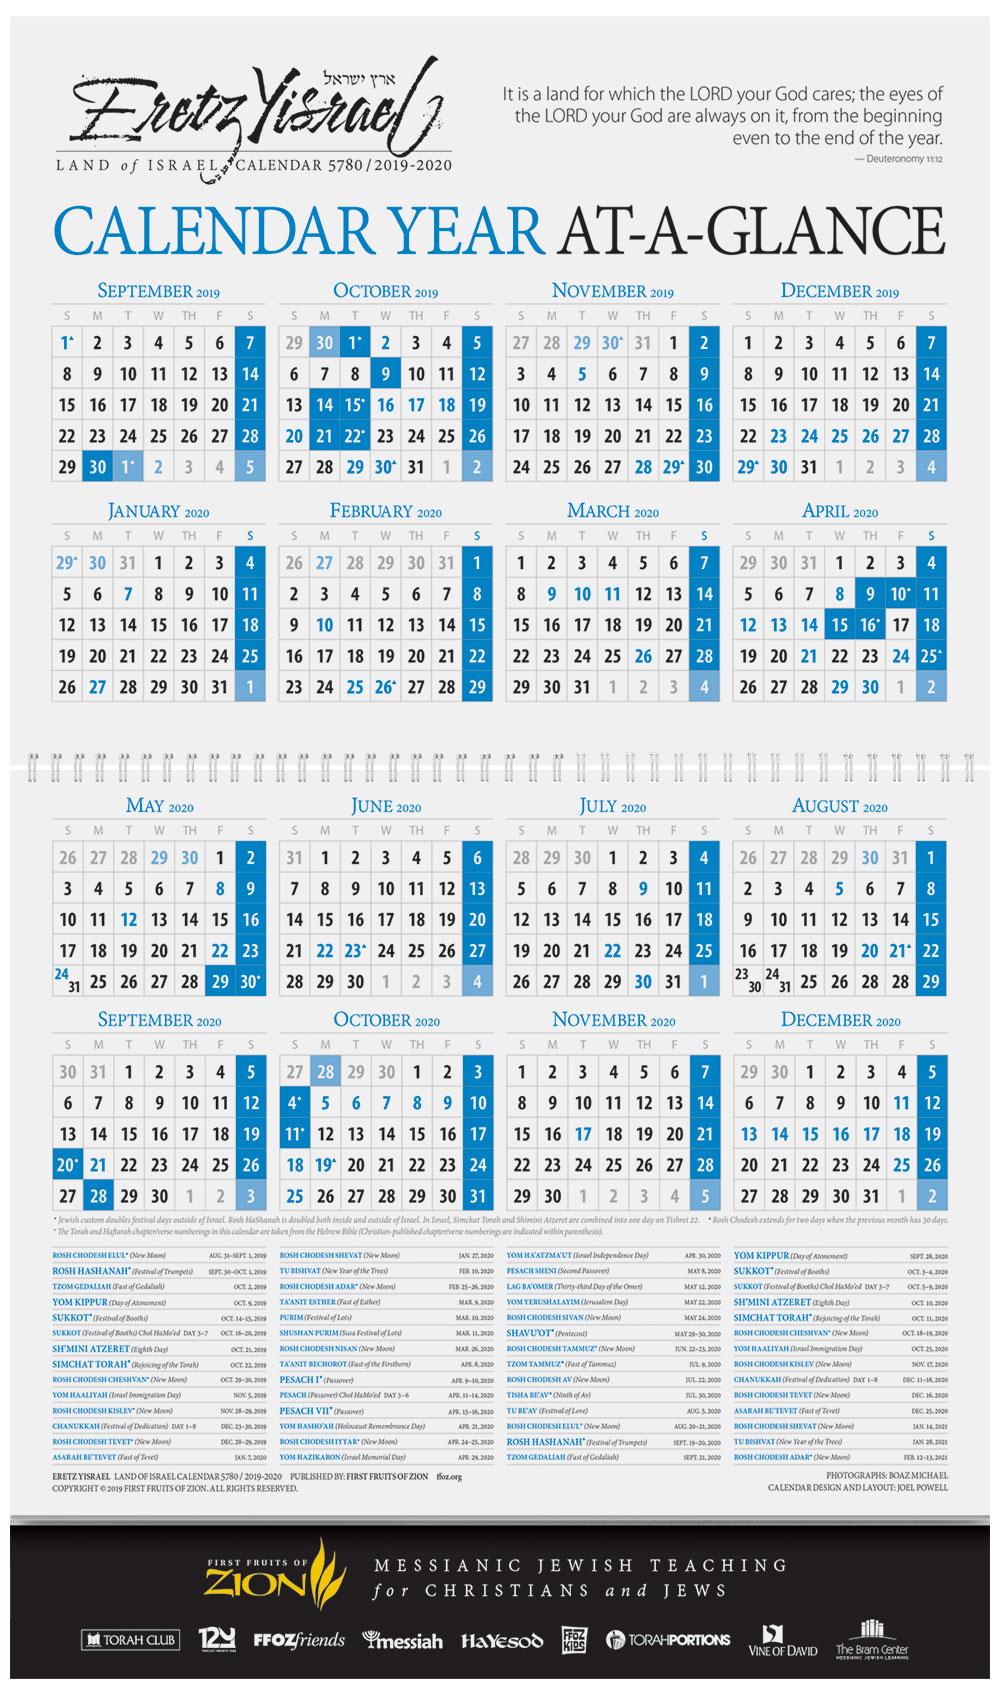 Eretz Yisrael Wall Calendar - 5780 (2019-2020) throughout Ewish Calendar 2019 - 2020